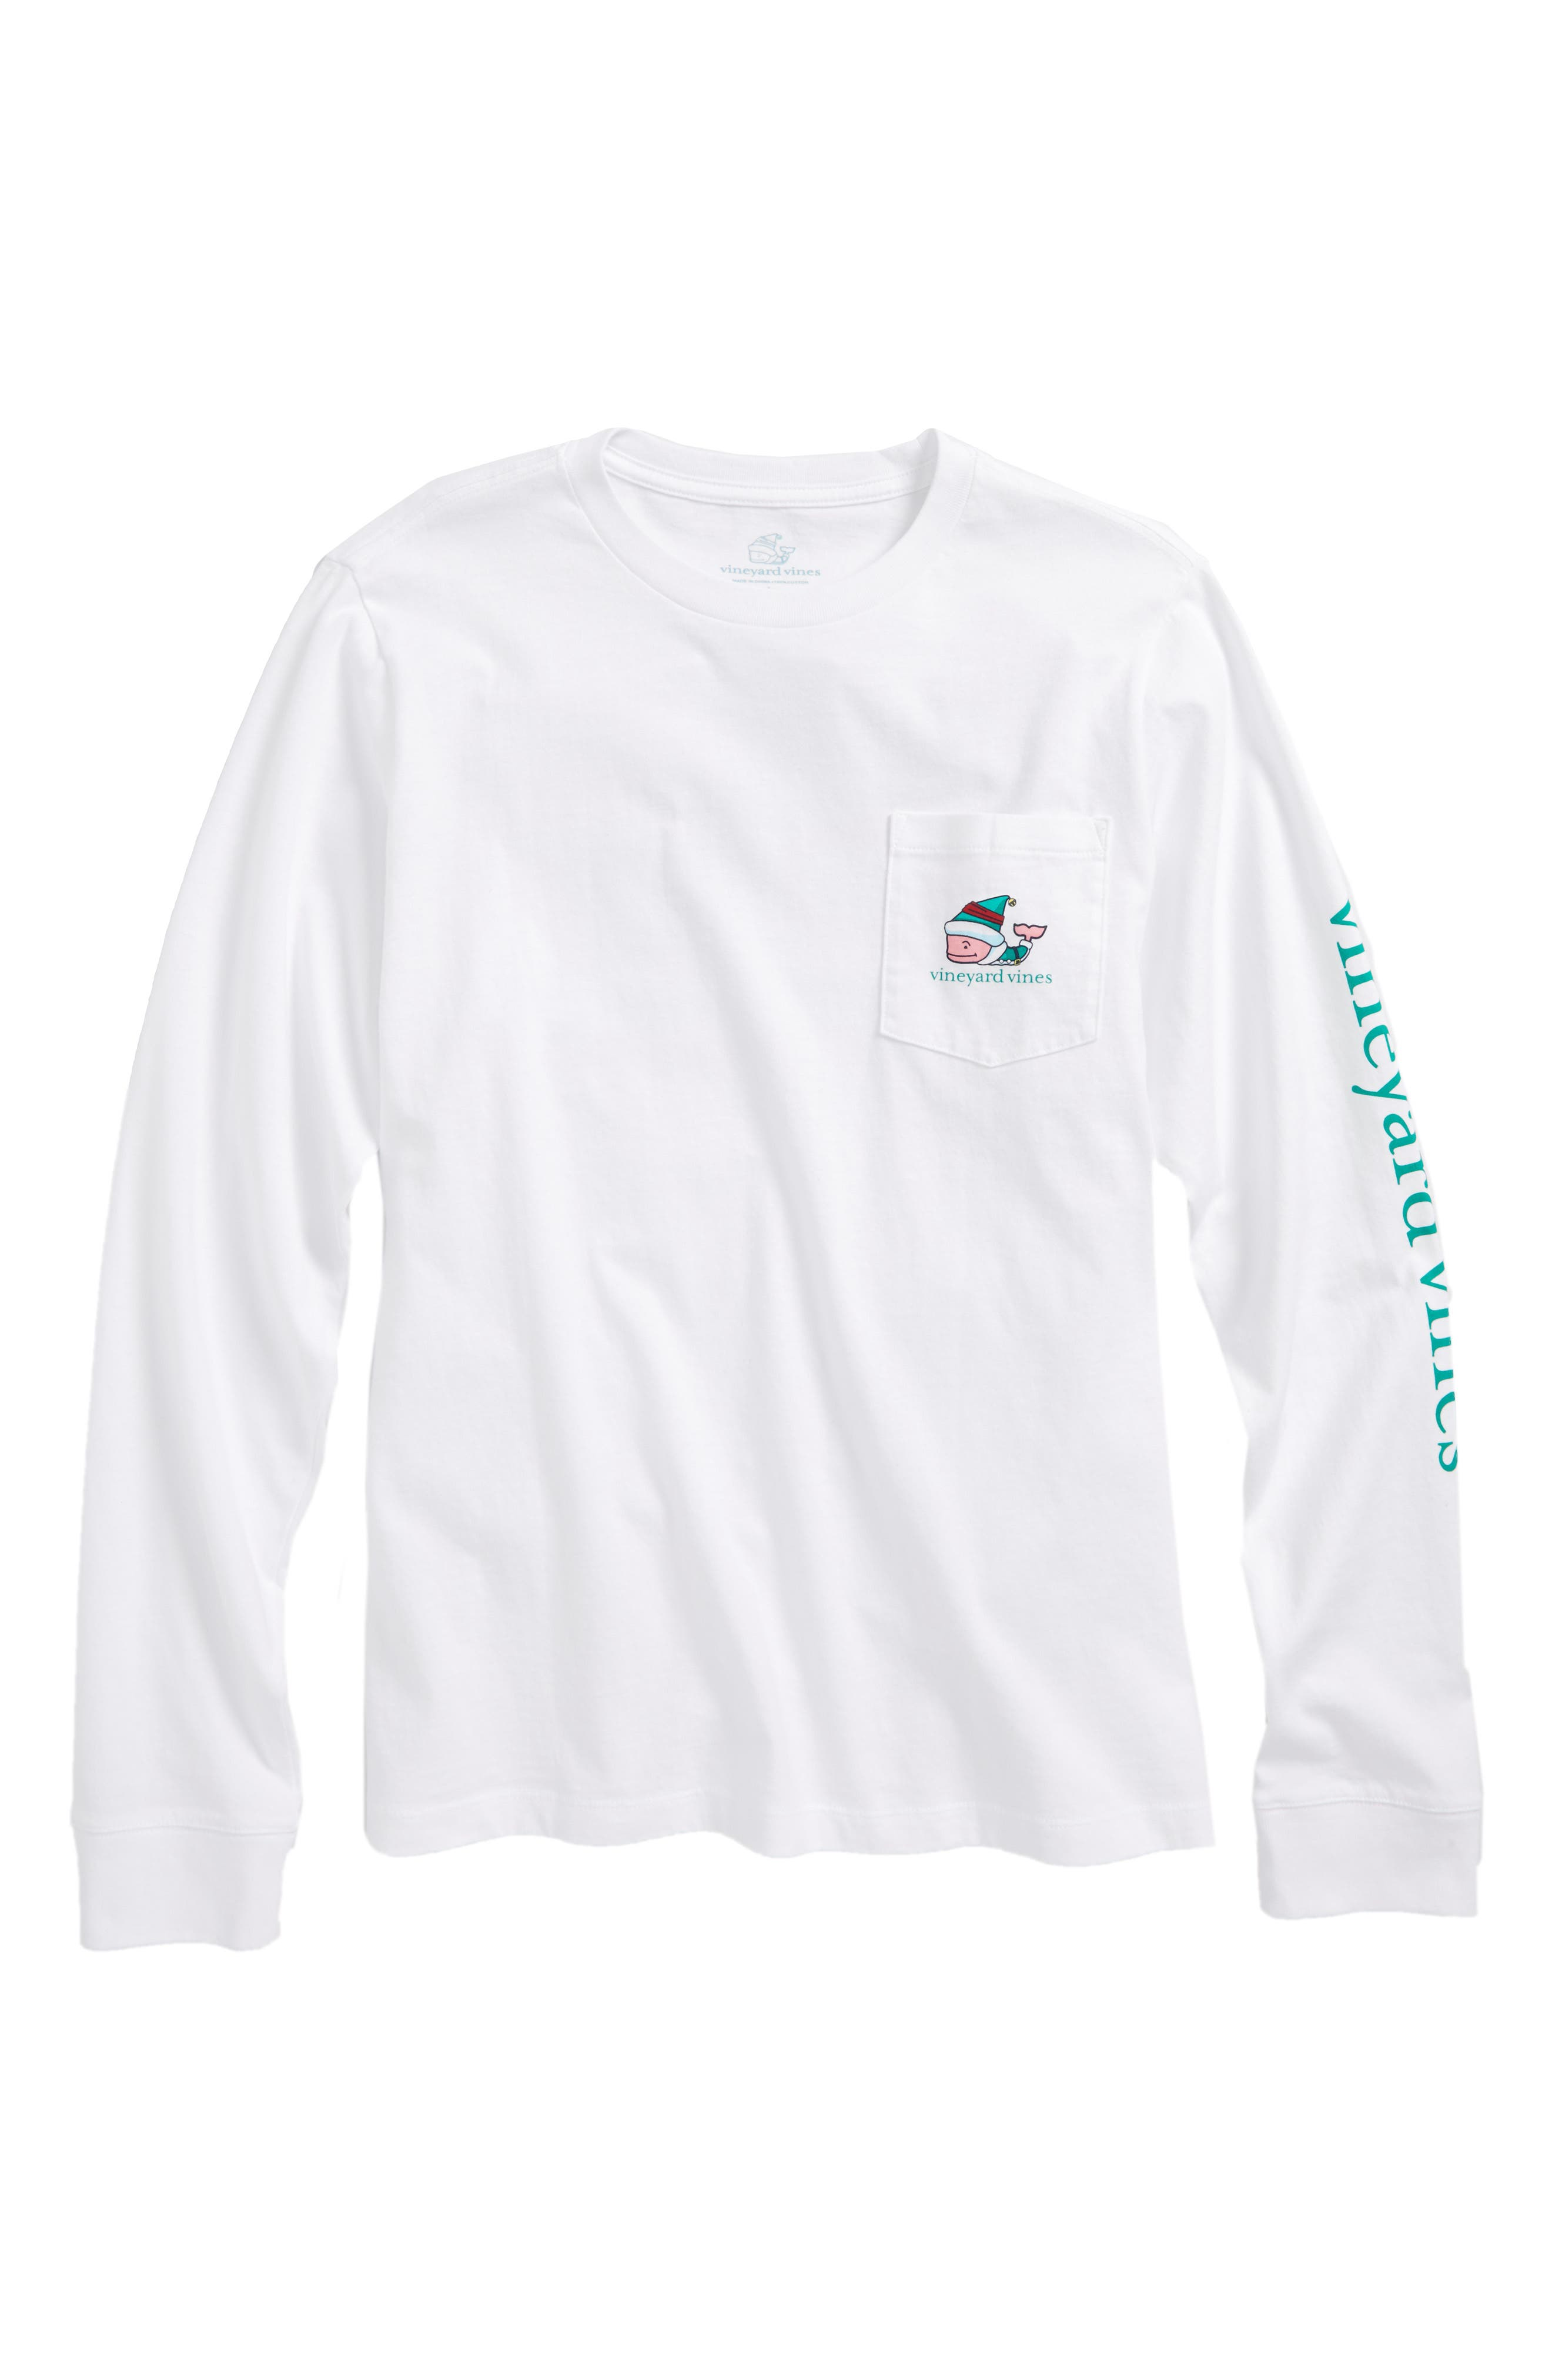 vineyard vines Elf Whale Merry Christmas 2017 Print T-Shirt (Big Boys)